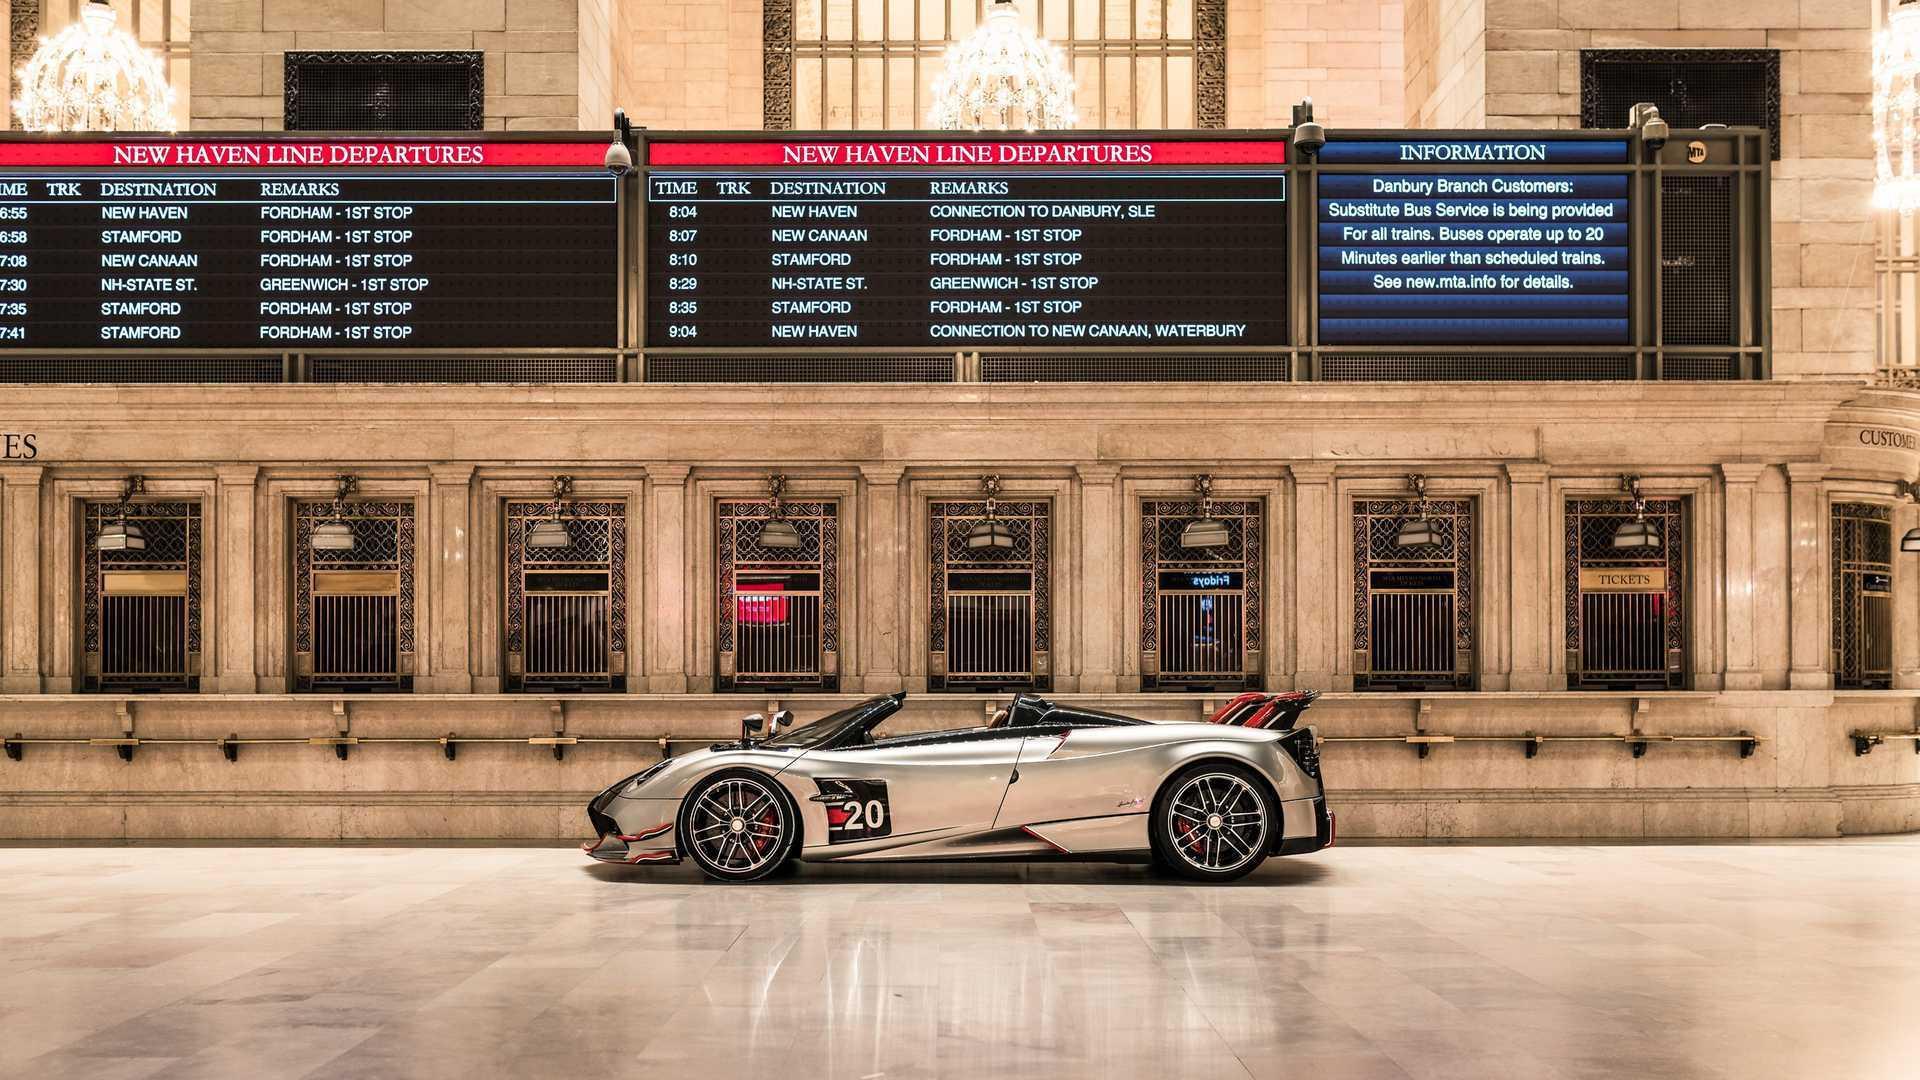 Huayra Roadster BC 亮相纽约中央火车站